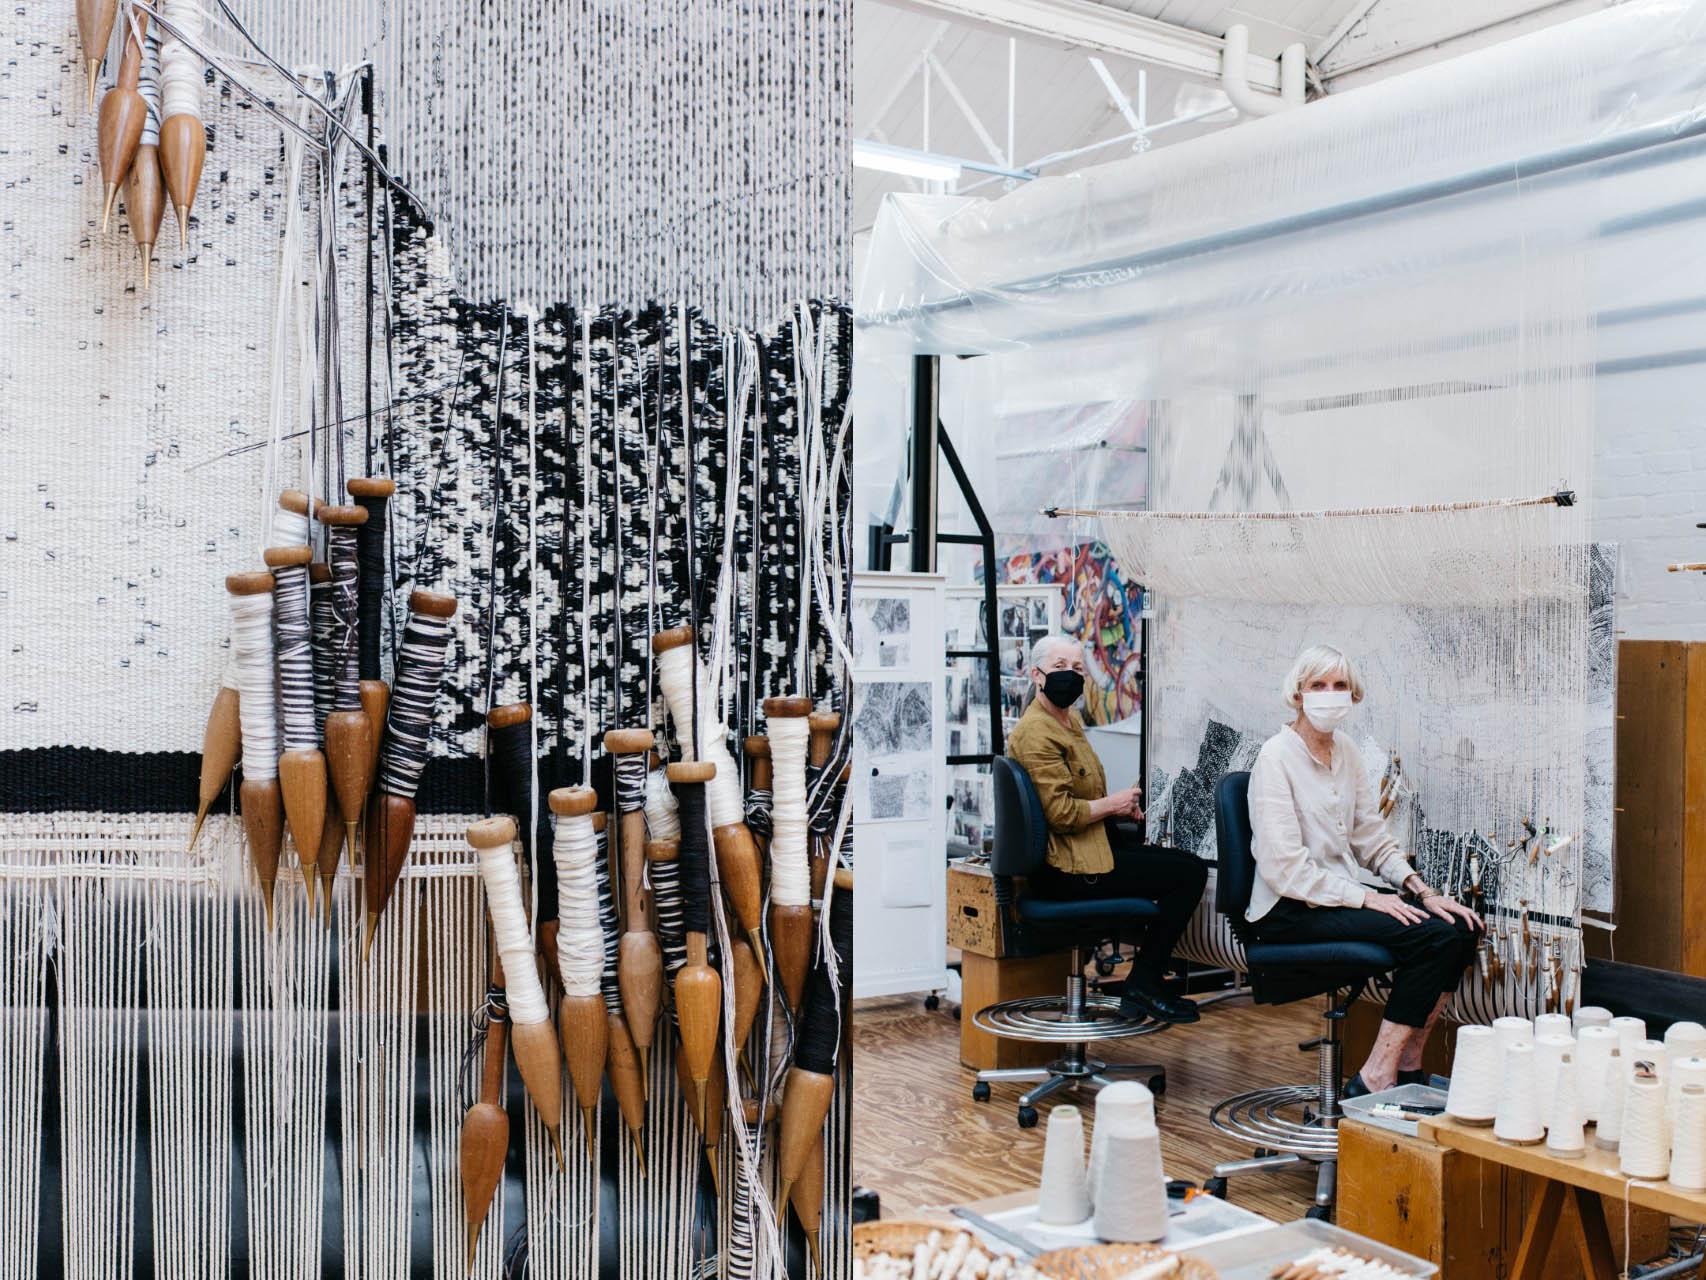 Left to right: Close up detail shot of 'Ilpili', designed by Pepai Jangala Carroll in 2021; ATW weavers Pamela Joyce & Cheryl Thornton working on 'Ilpili', designed by Pepai Jangala Carroll in 2021. Photos: Marie-Luise Skibbe.